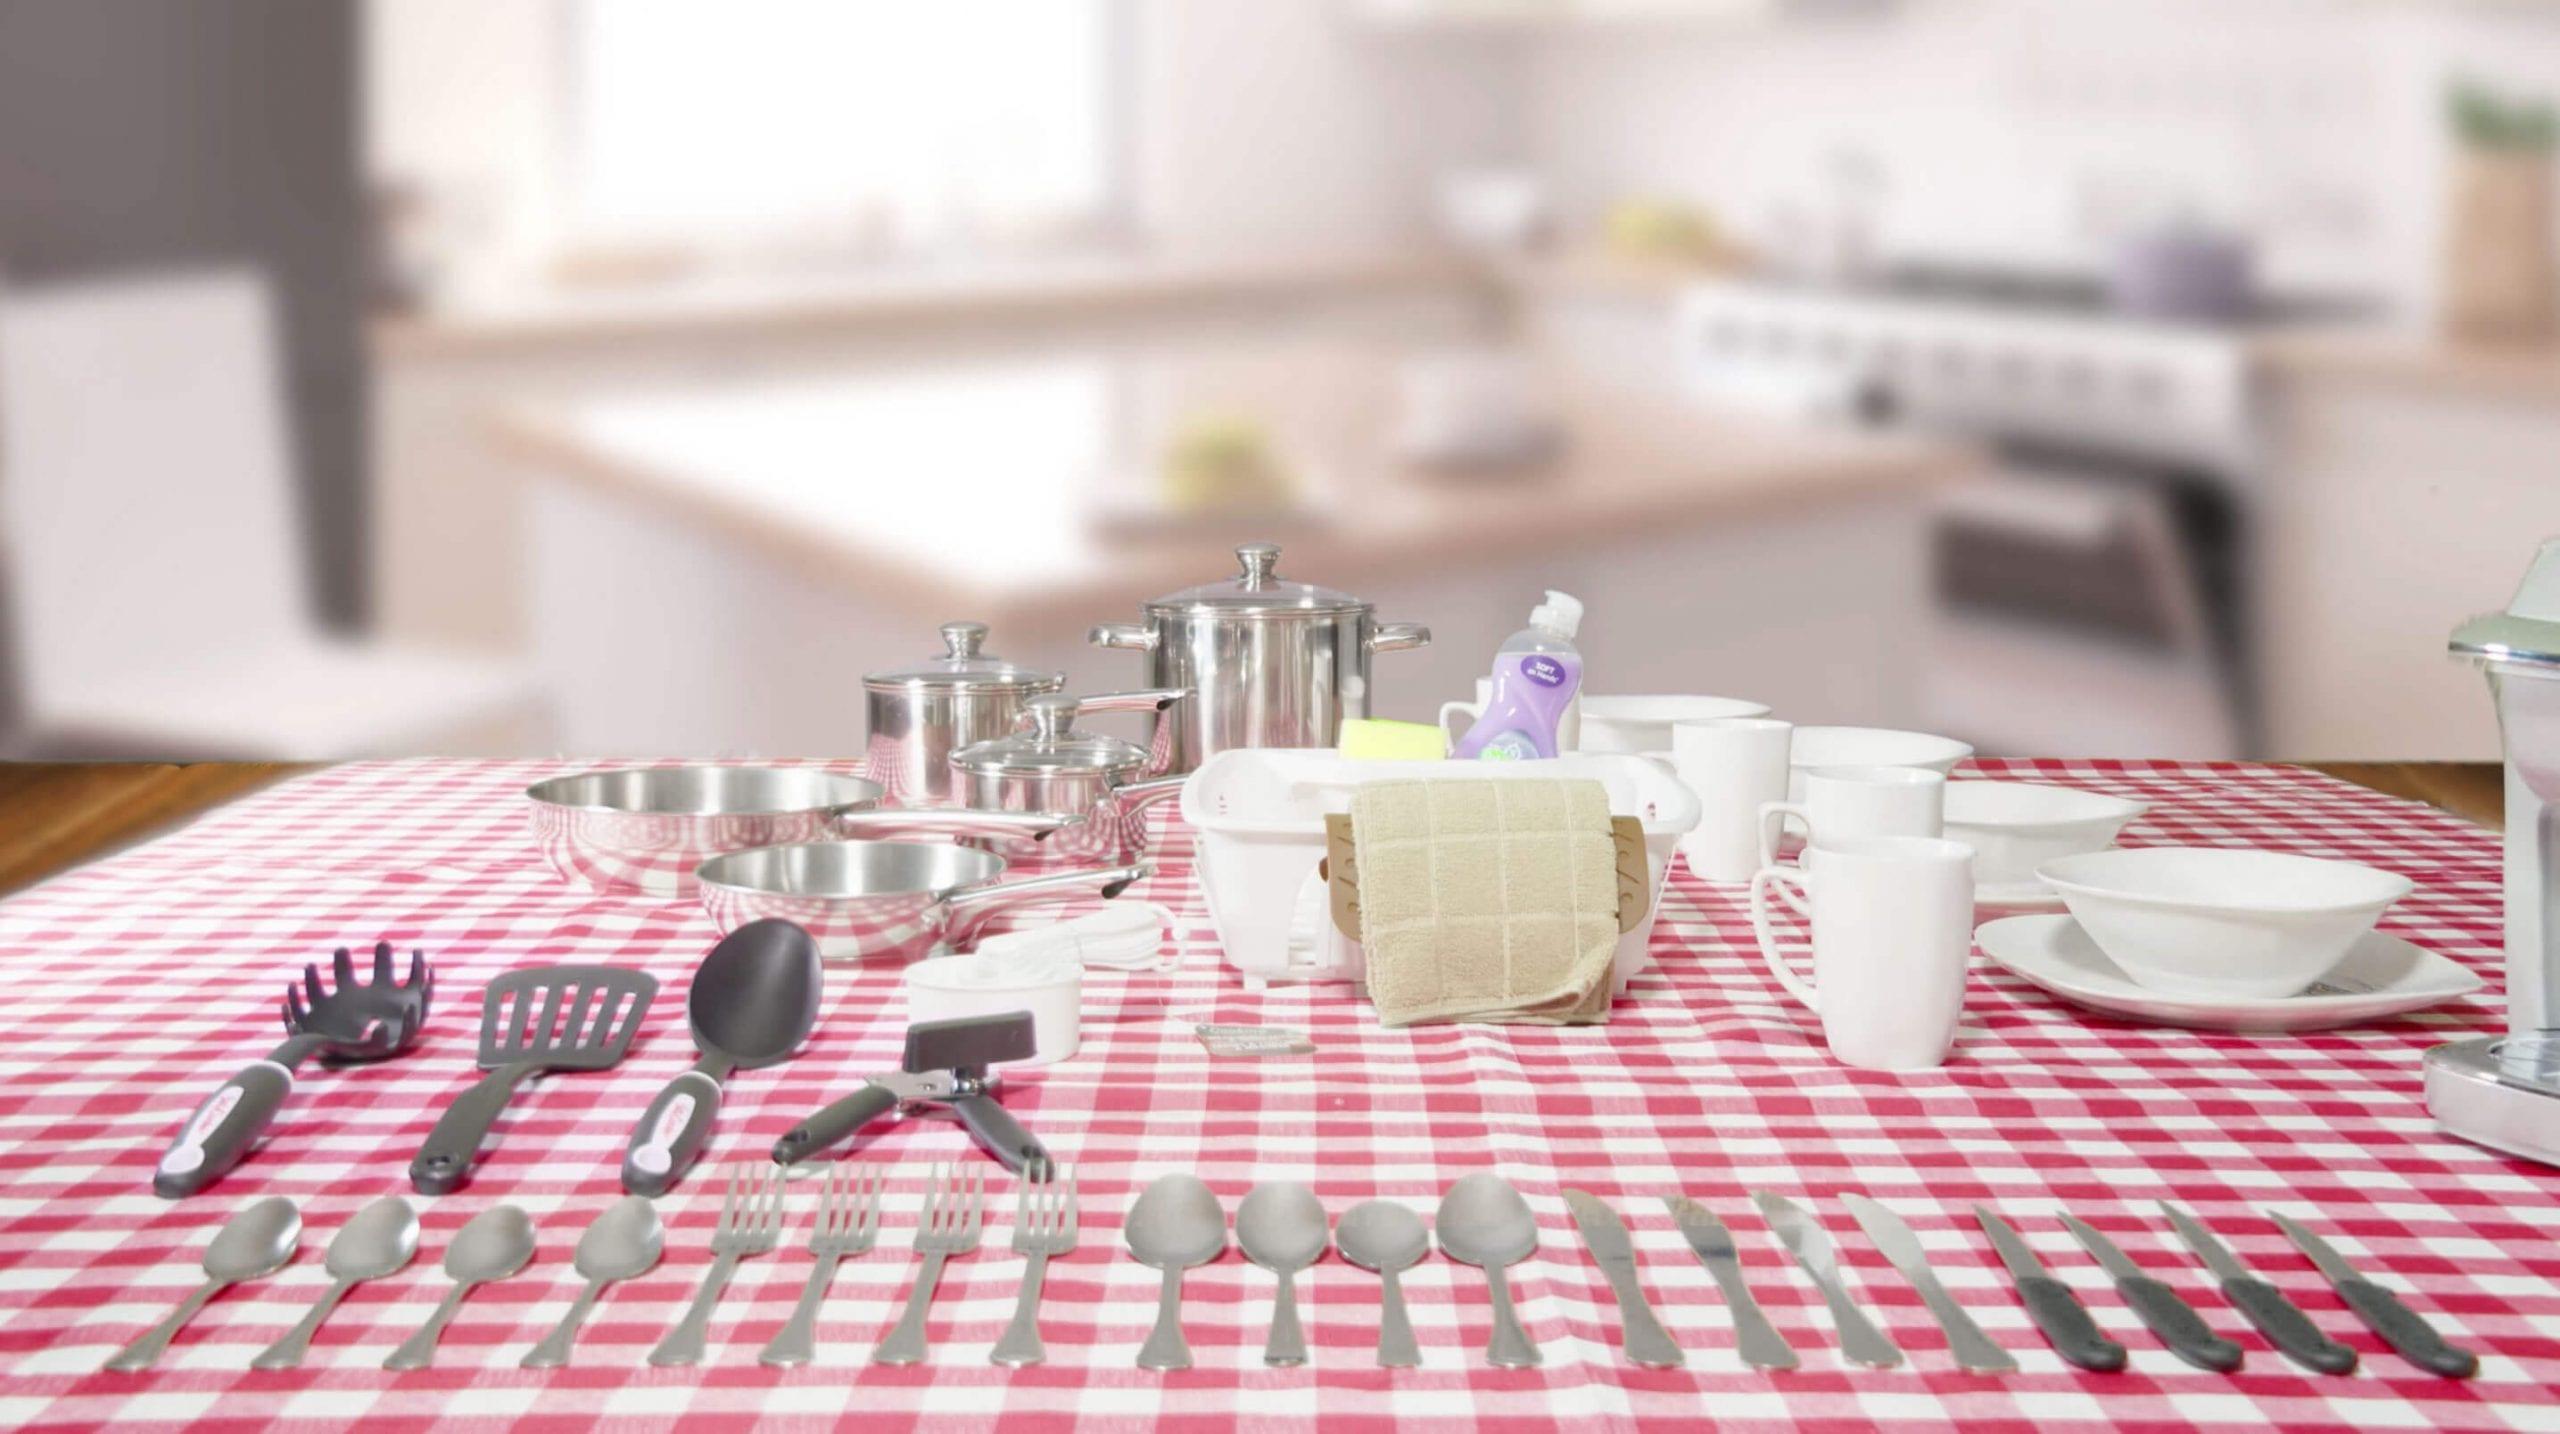 Kitchen Kit With All RV Rentals - Happy Campers RV Rentals